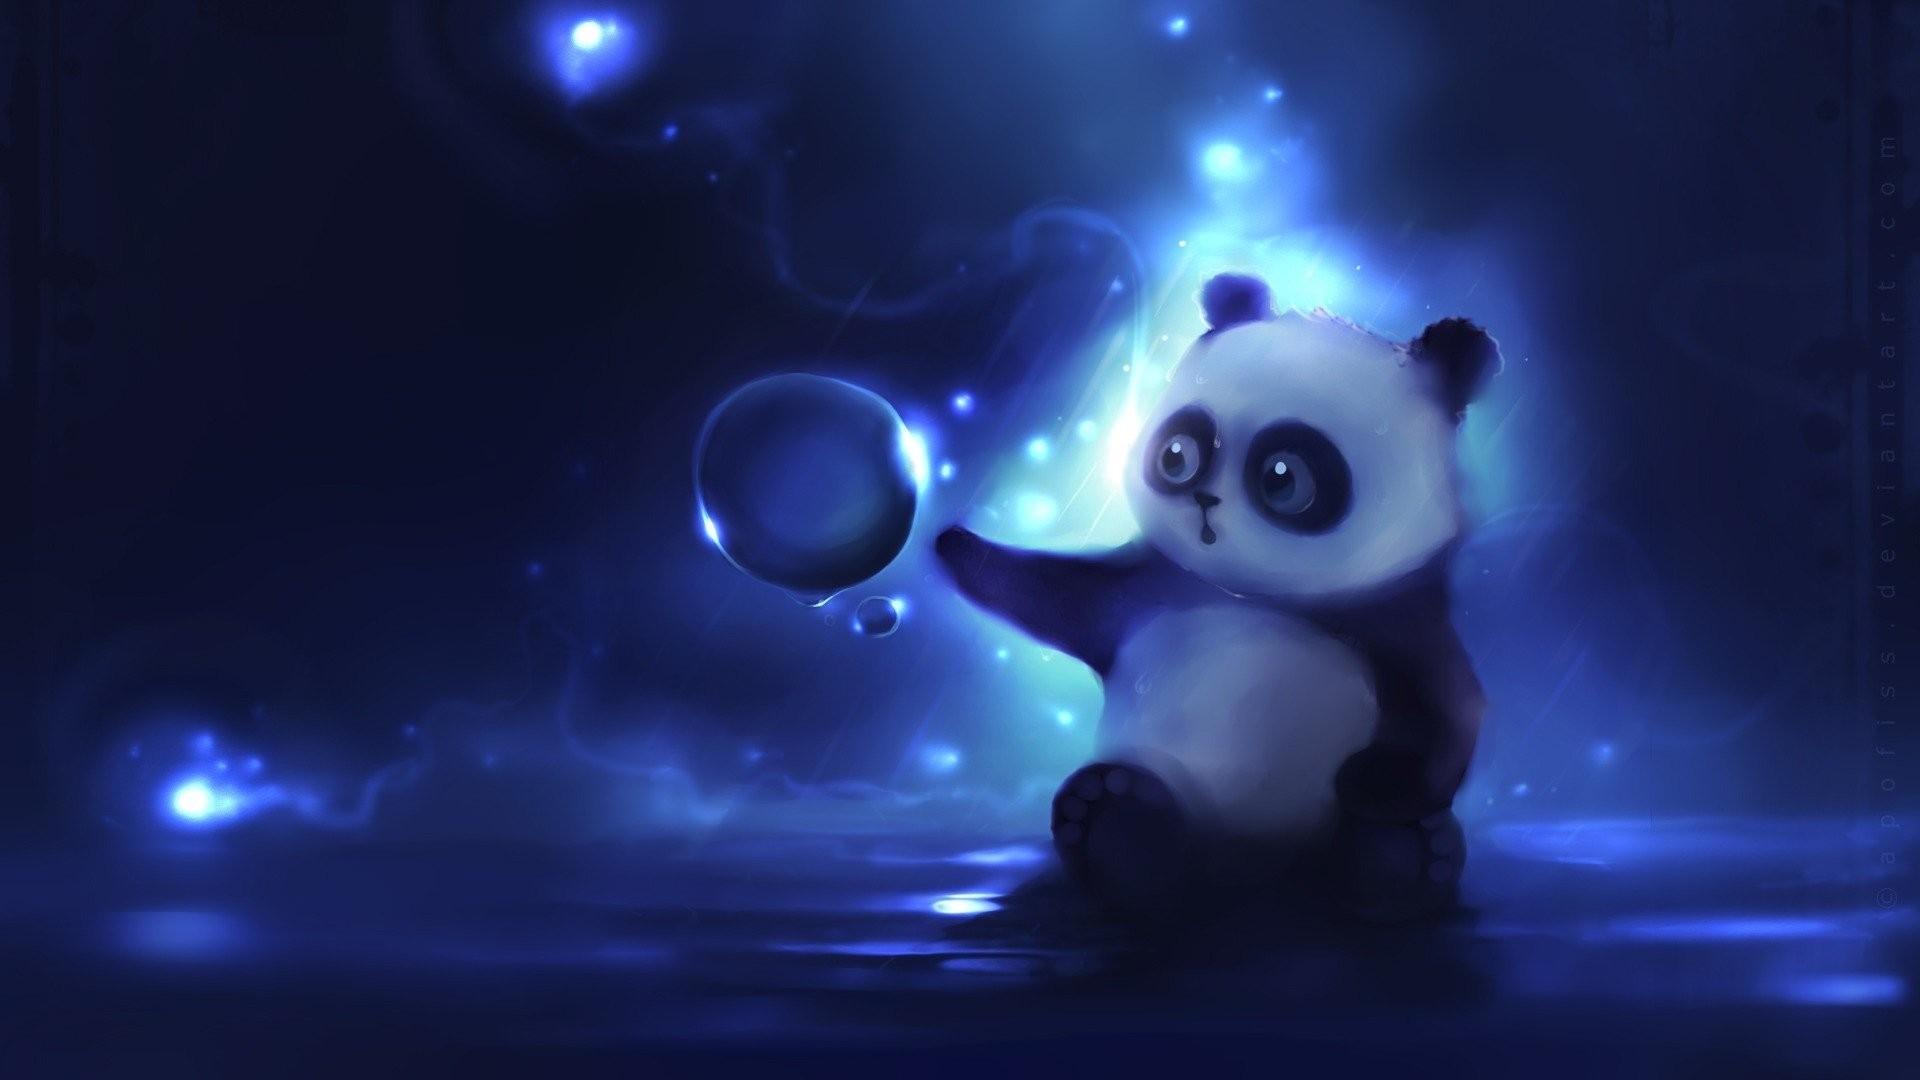 Res: 1920x1080, HD Wallpaper   Hintergrund ID:361513.  Tiere Panda